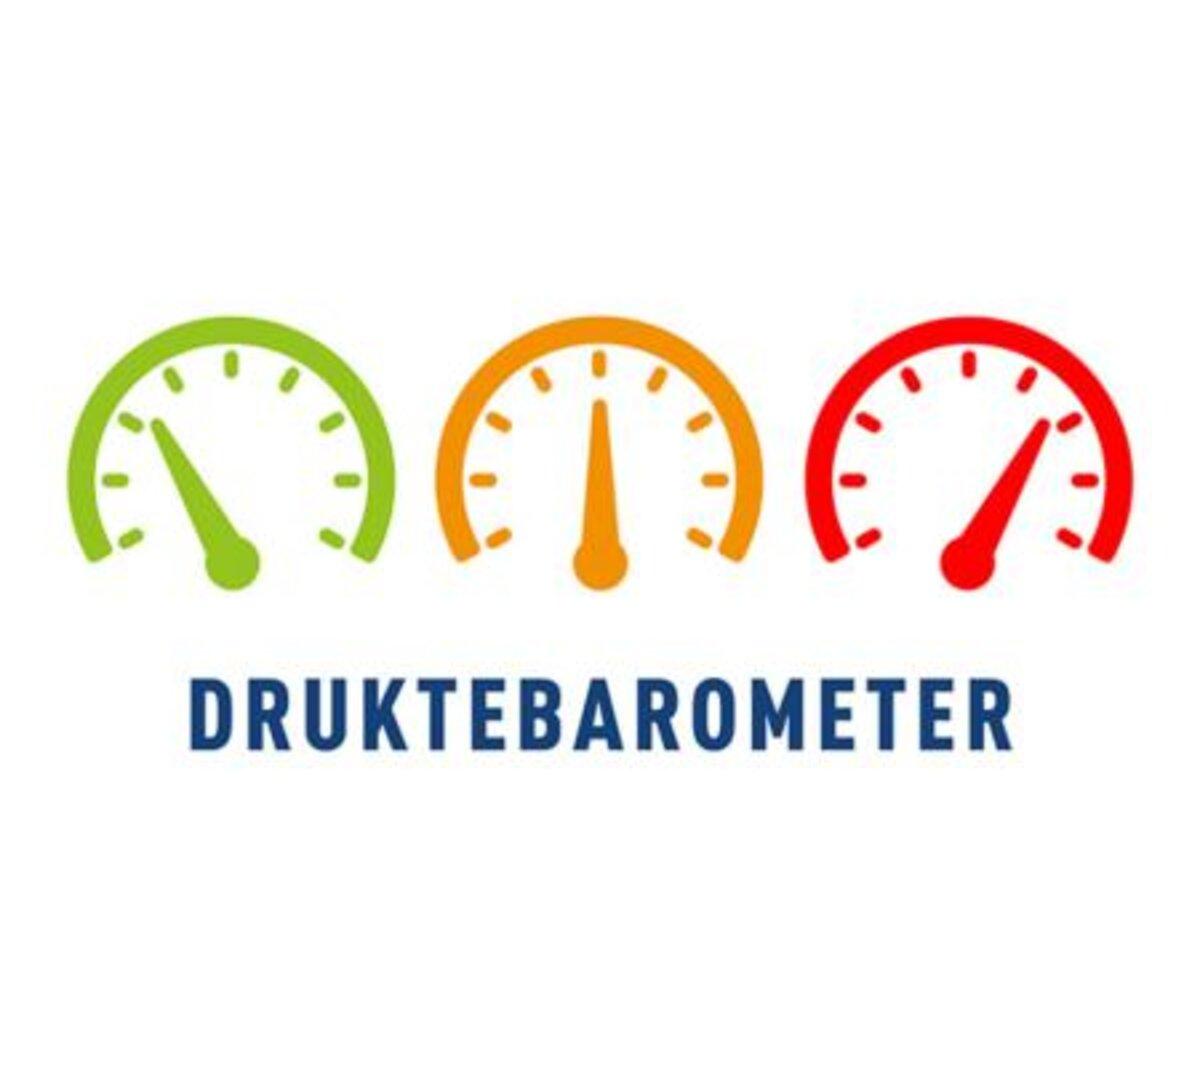 Druktebarometer